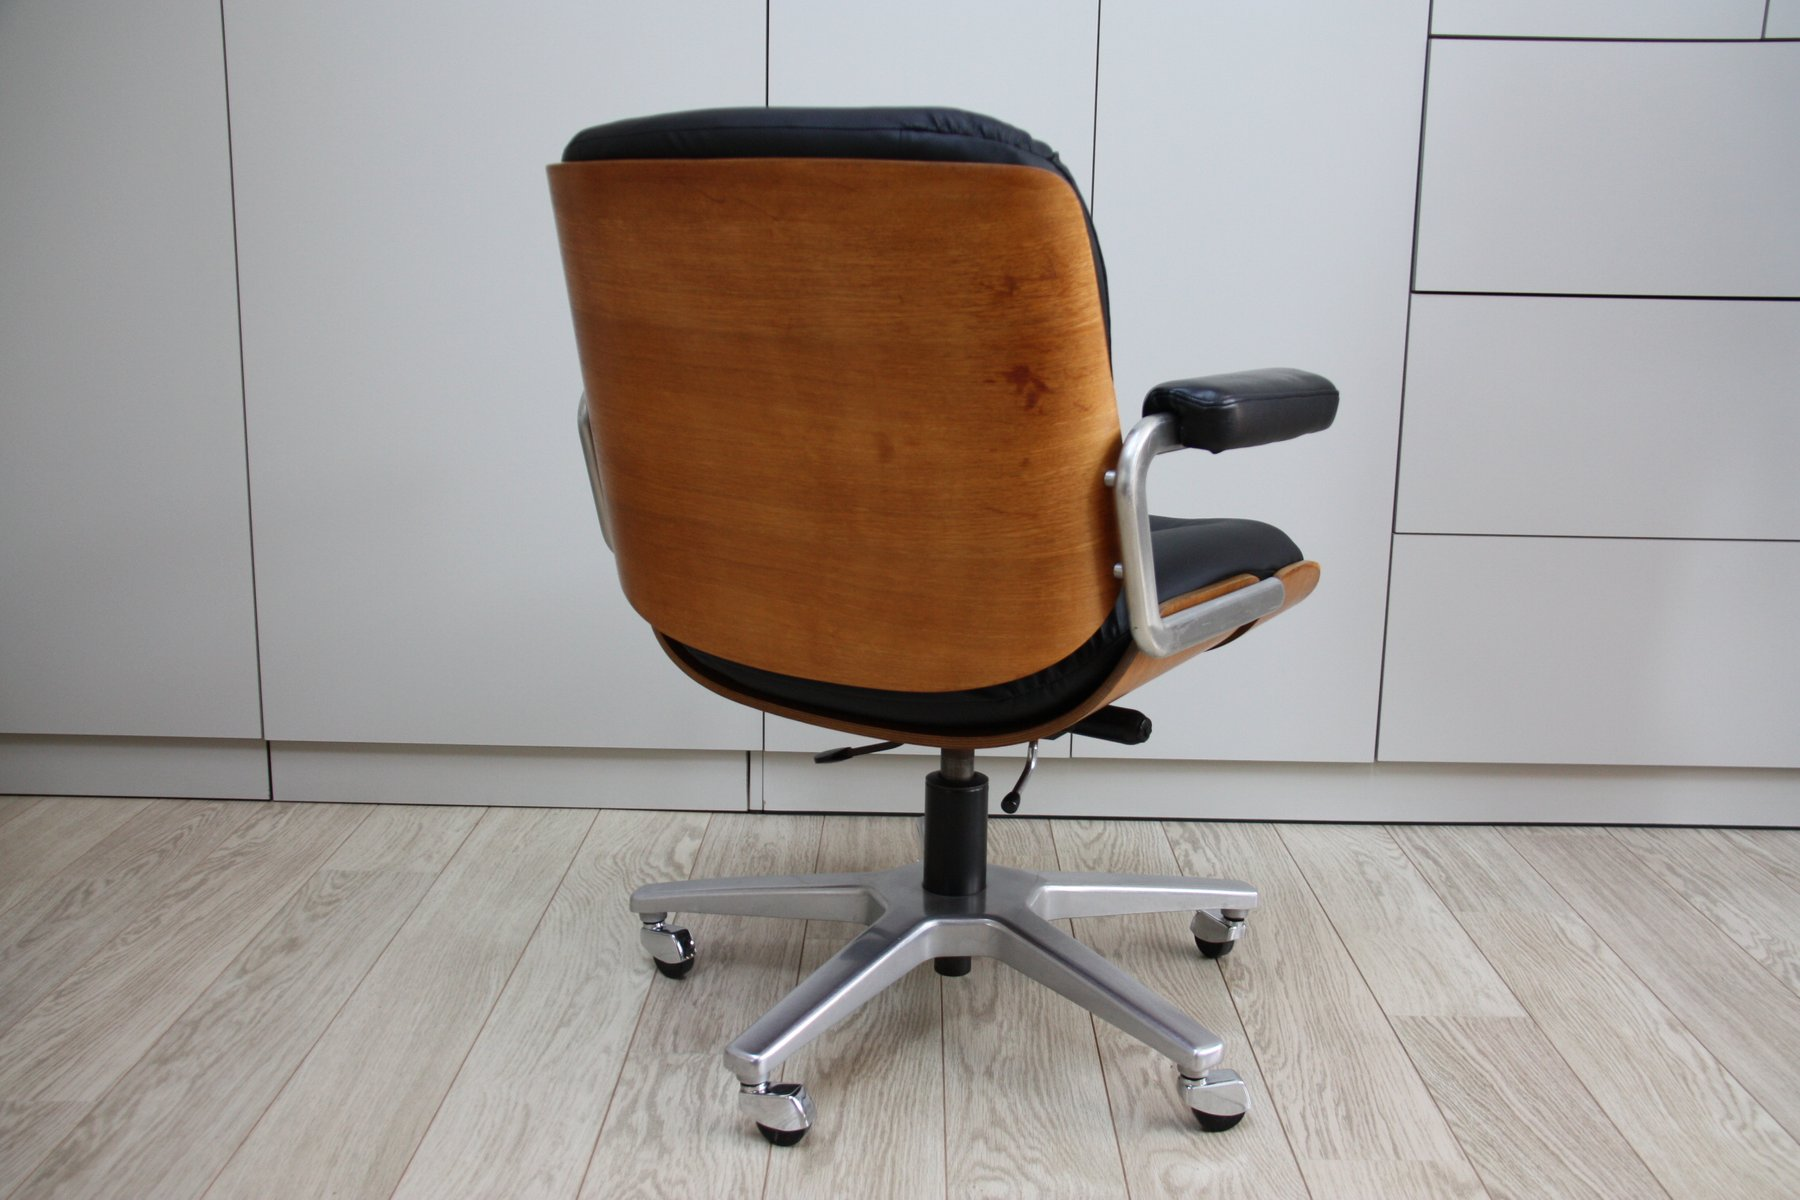 Vintage Swivel Office Chair In Black Leather U0026 Wood By Karl Dittert For  Giroflex 1960s Wooden Swivel Desk Chair H8